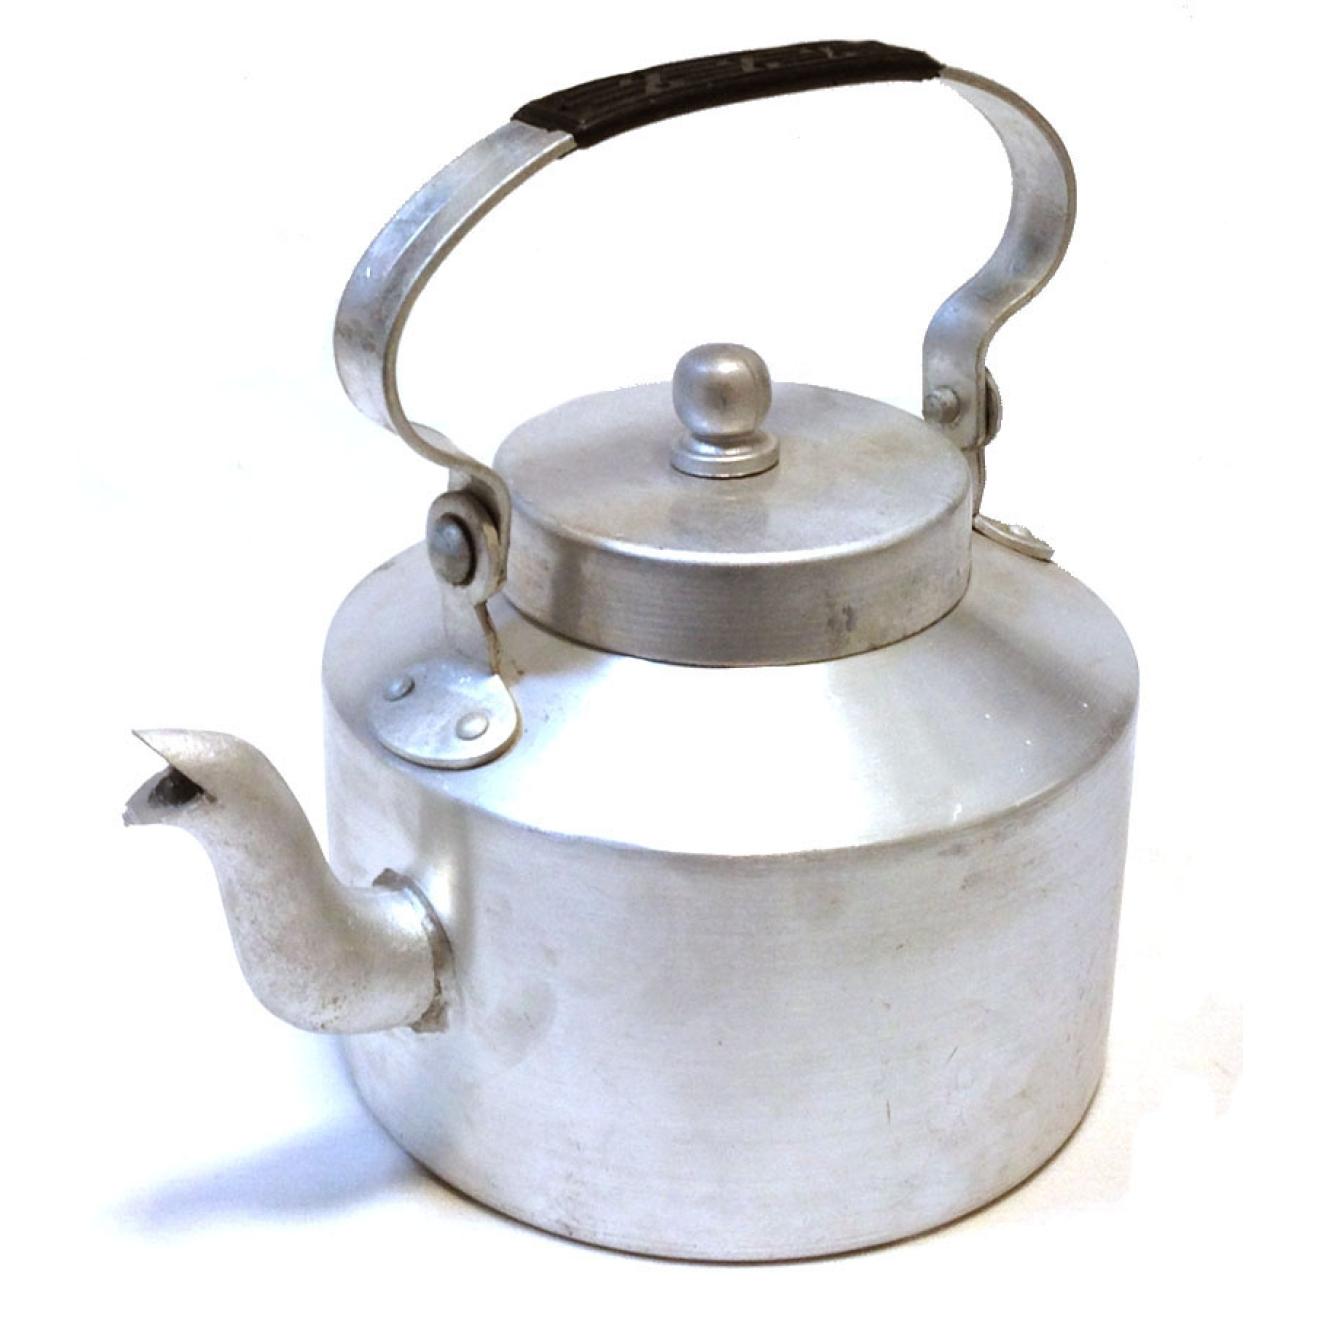 Aluminum Tea Kettle 2 5l